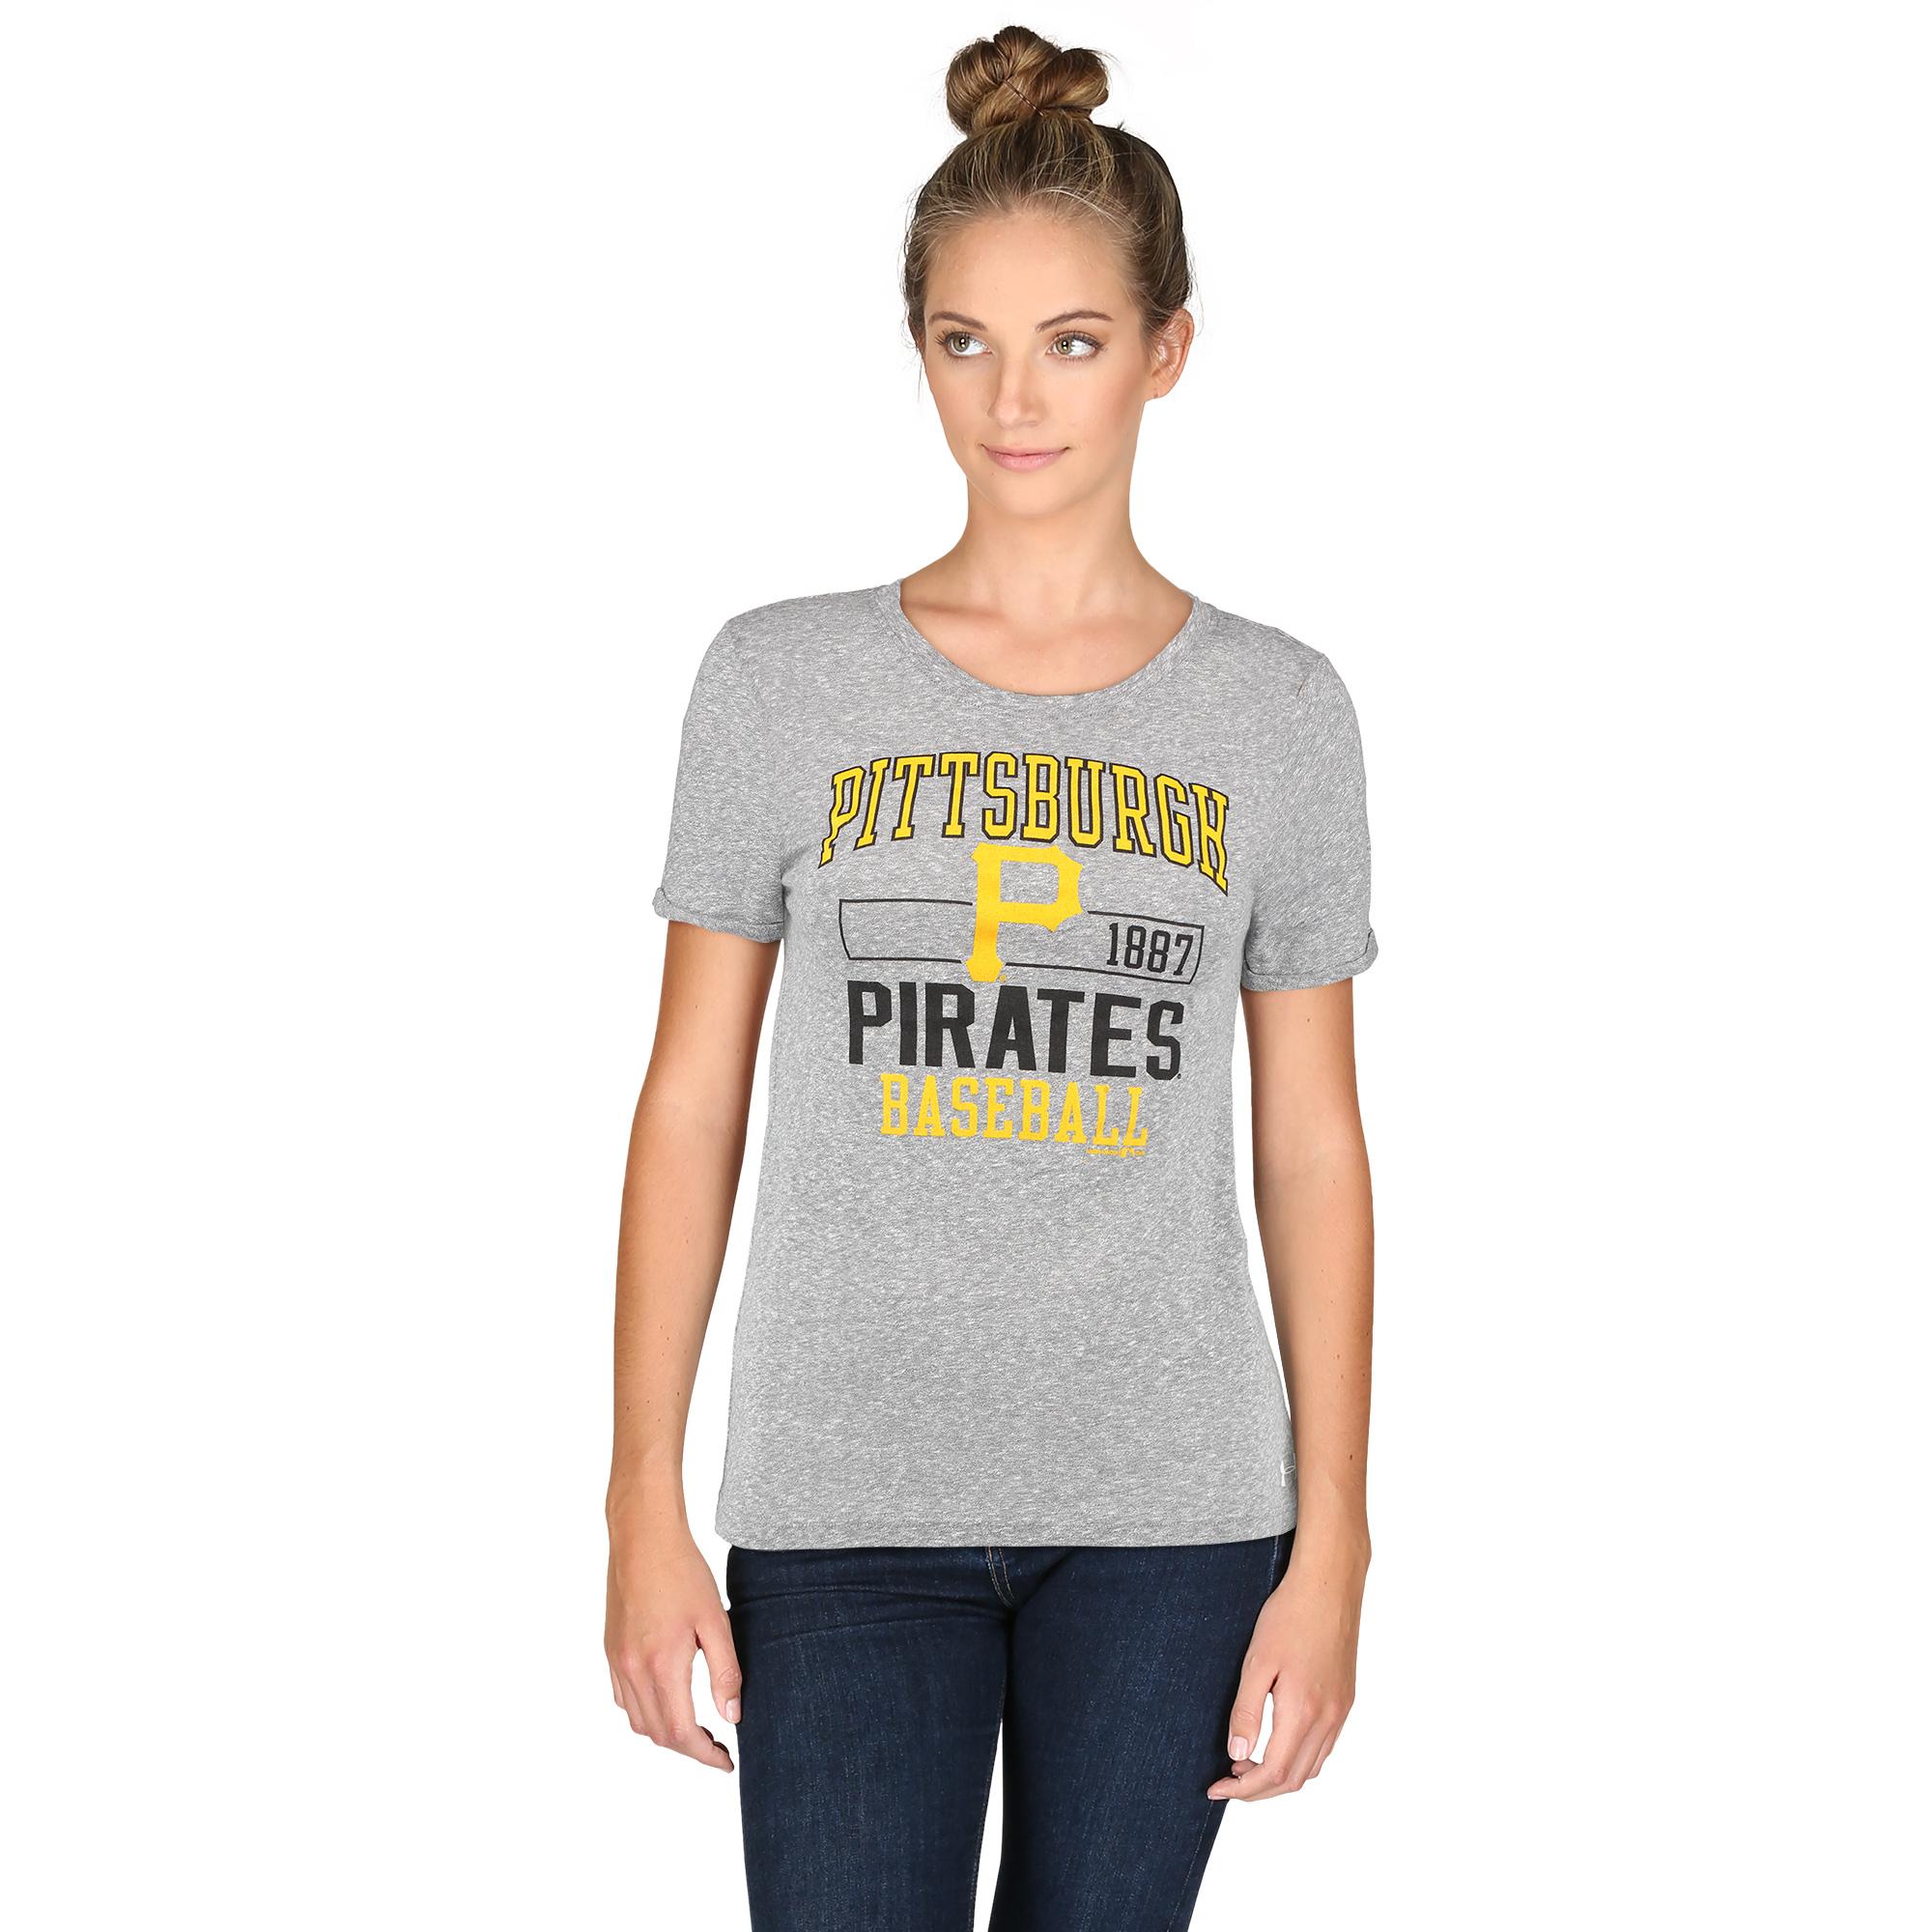 Pittsburgh Pirates Under Armour Women's Crew Neck Performance T-Shirt - Heathered Gray